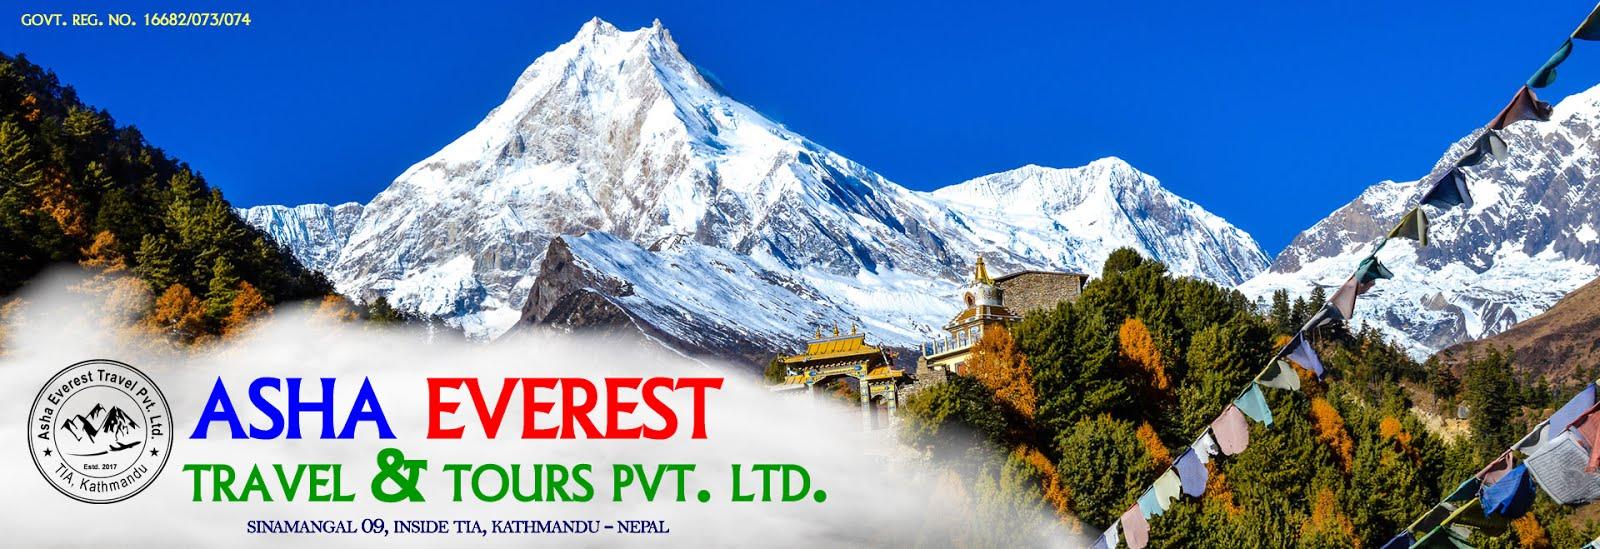 Asha Everest Travel & Tours Pvt. Ltd.